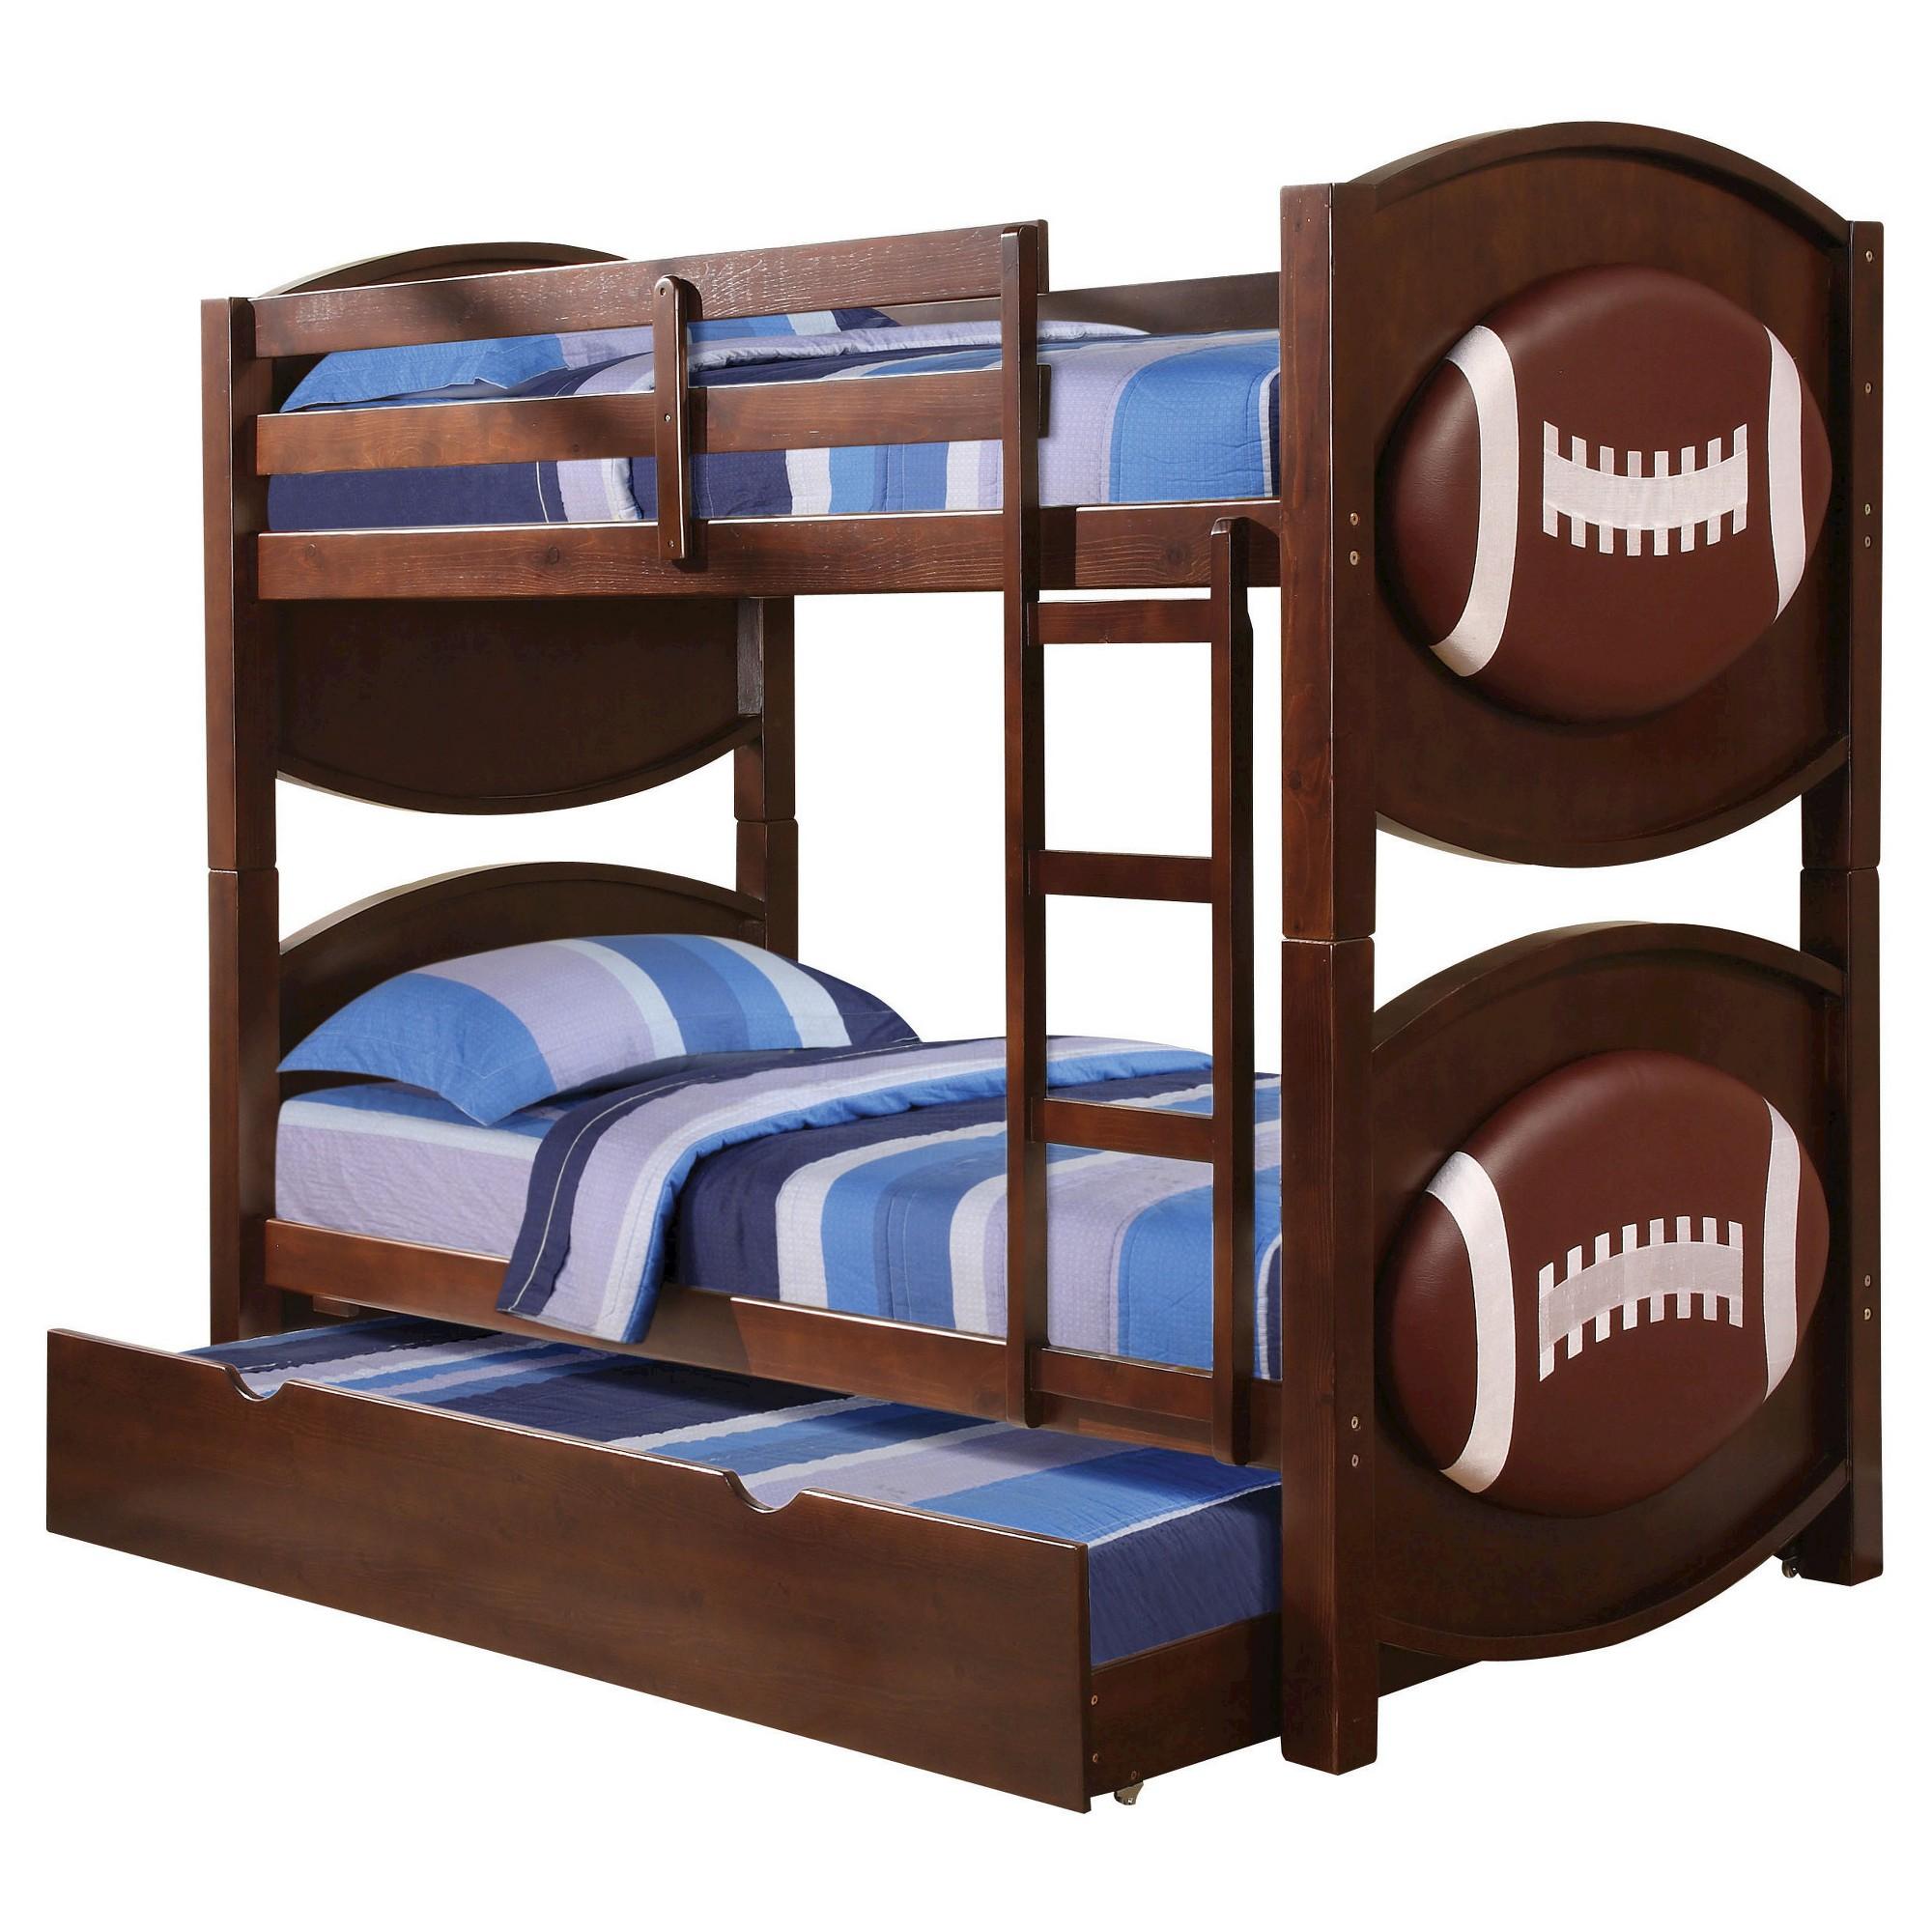 All Star Kids Football Bunk Bed - Espresso( Twin/Twin) - Acme ...